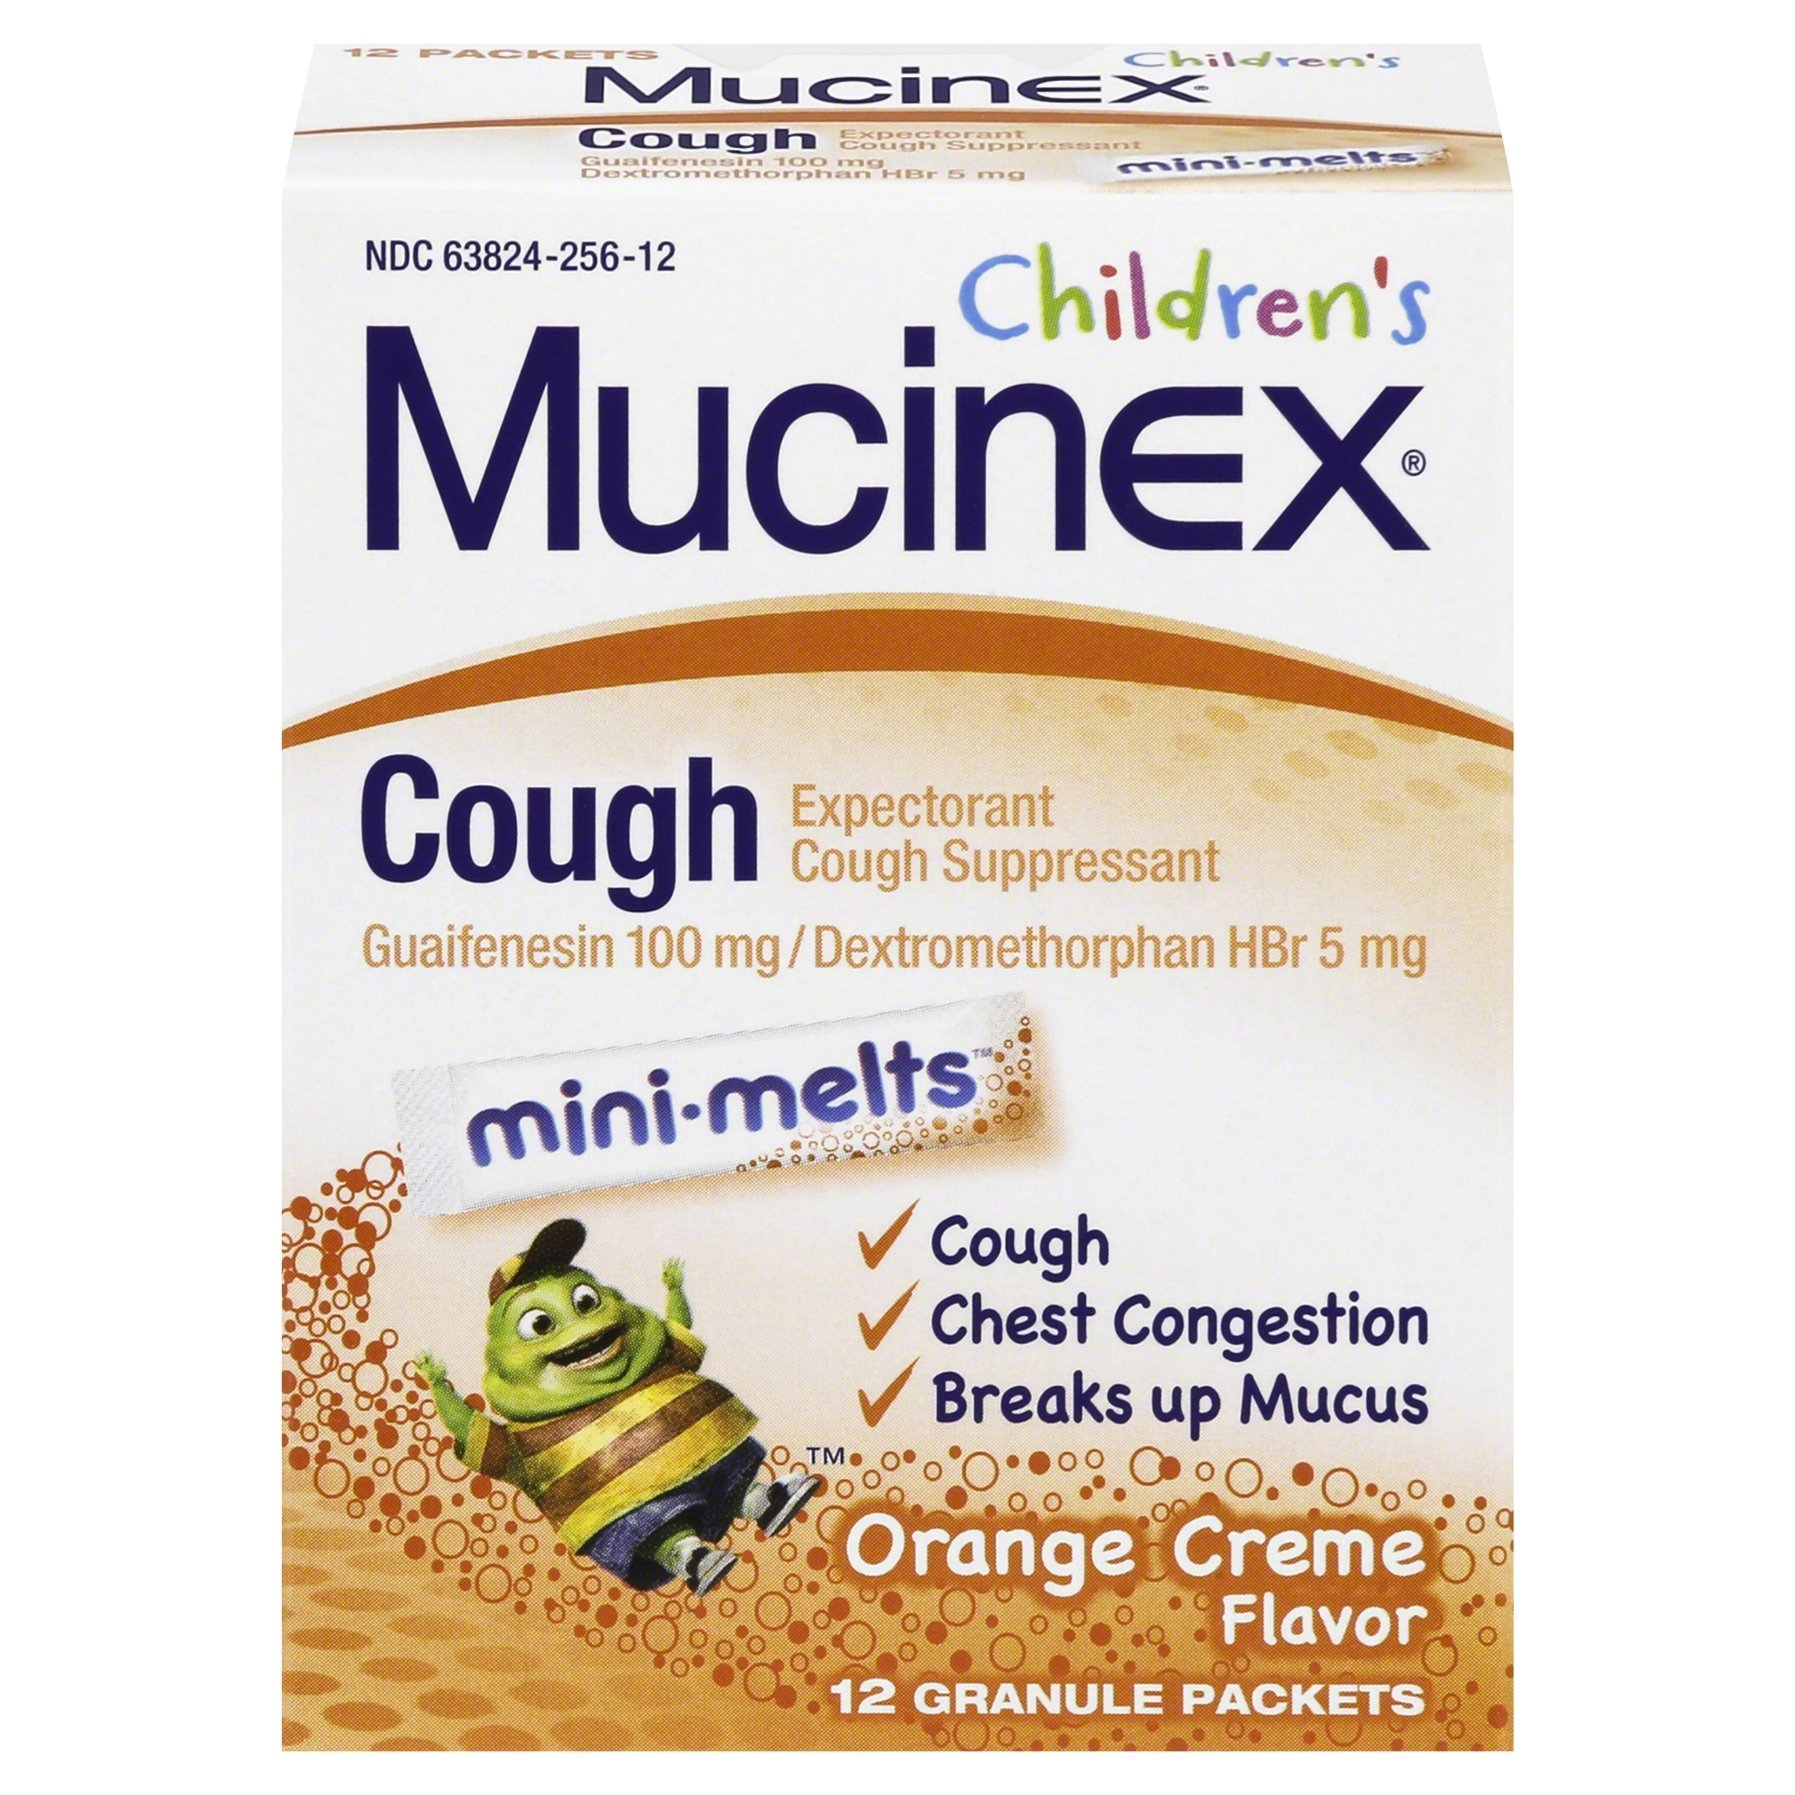 Mucinex Children's Chest Congestion Expectorant and Cough Suppressant Mini-Melts, Orange Crème (12 ct)